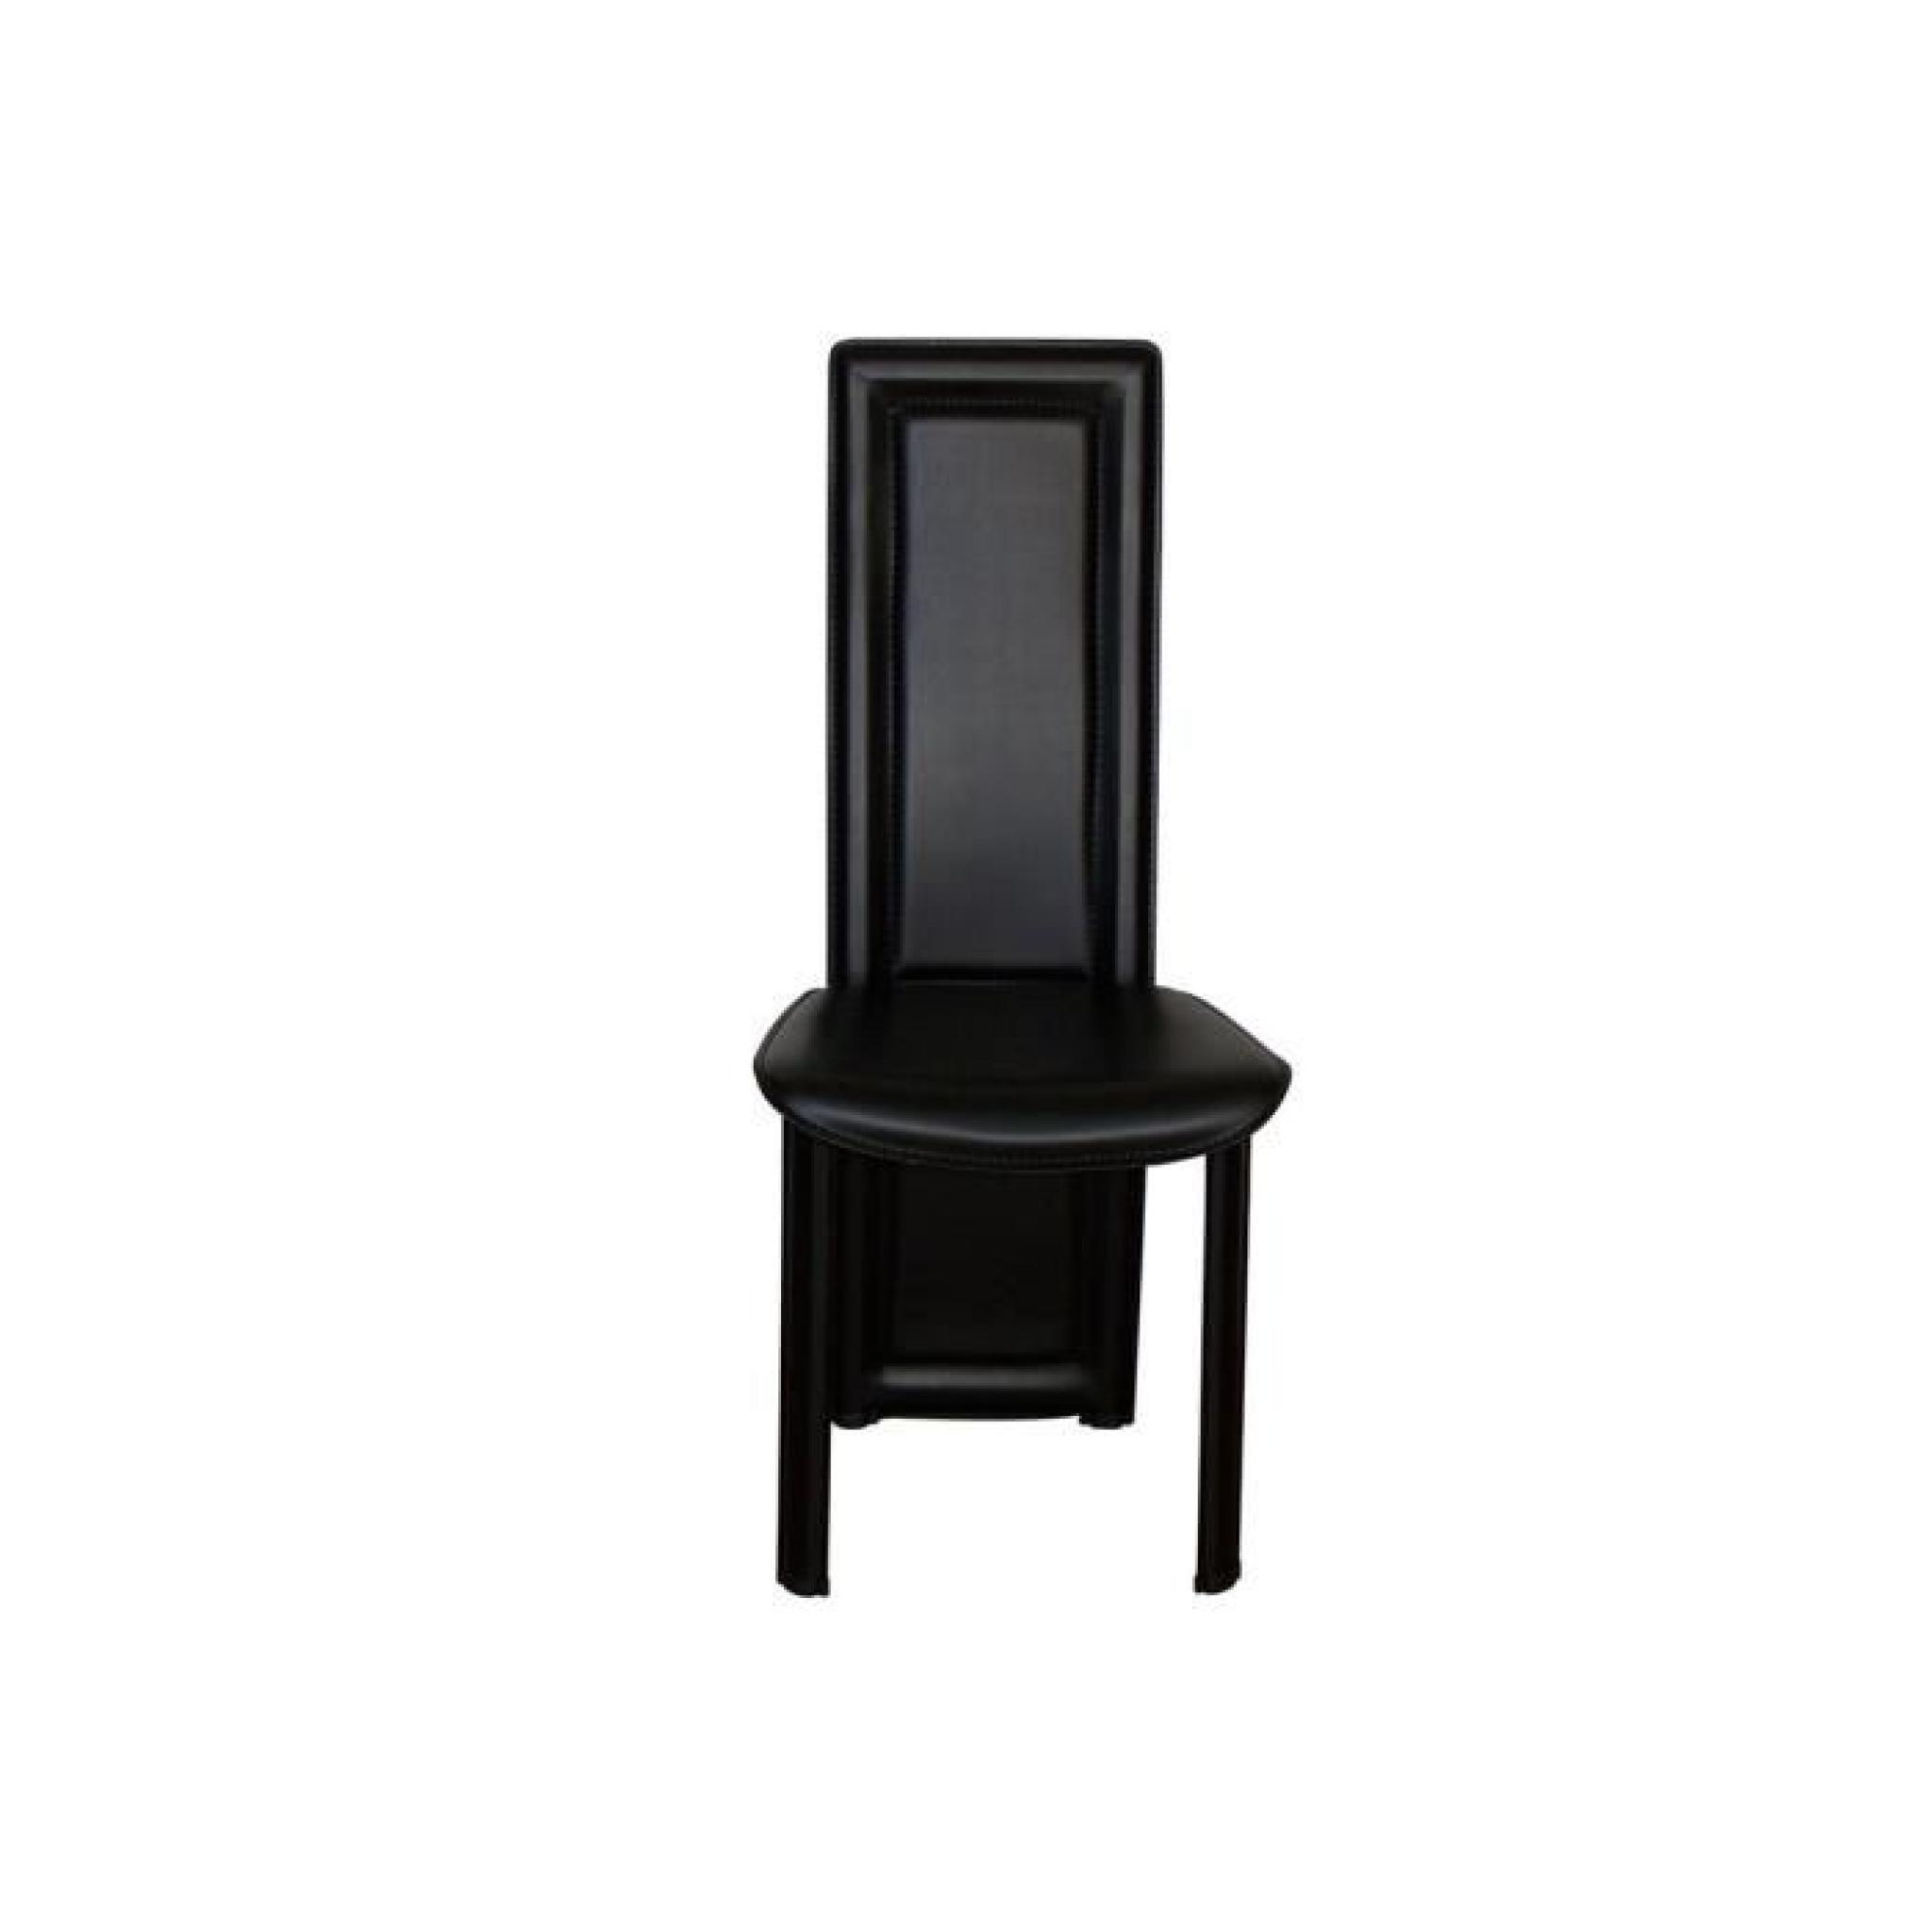 24 frais chaises salle manger noires phe2 meuble de for Chaises salle a manger 2 main